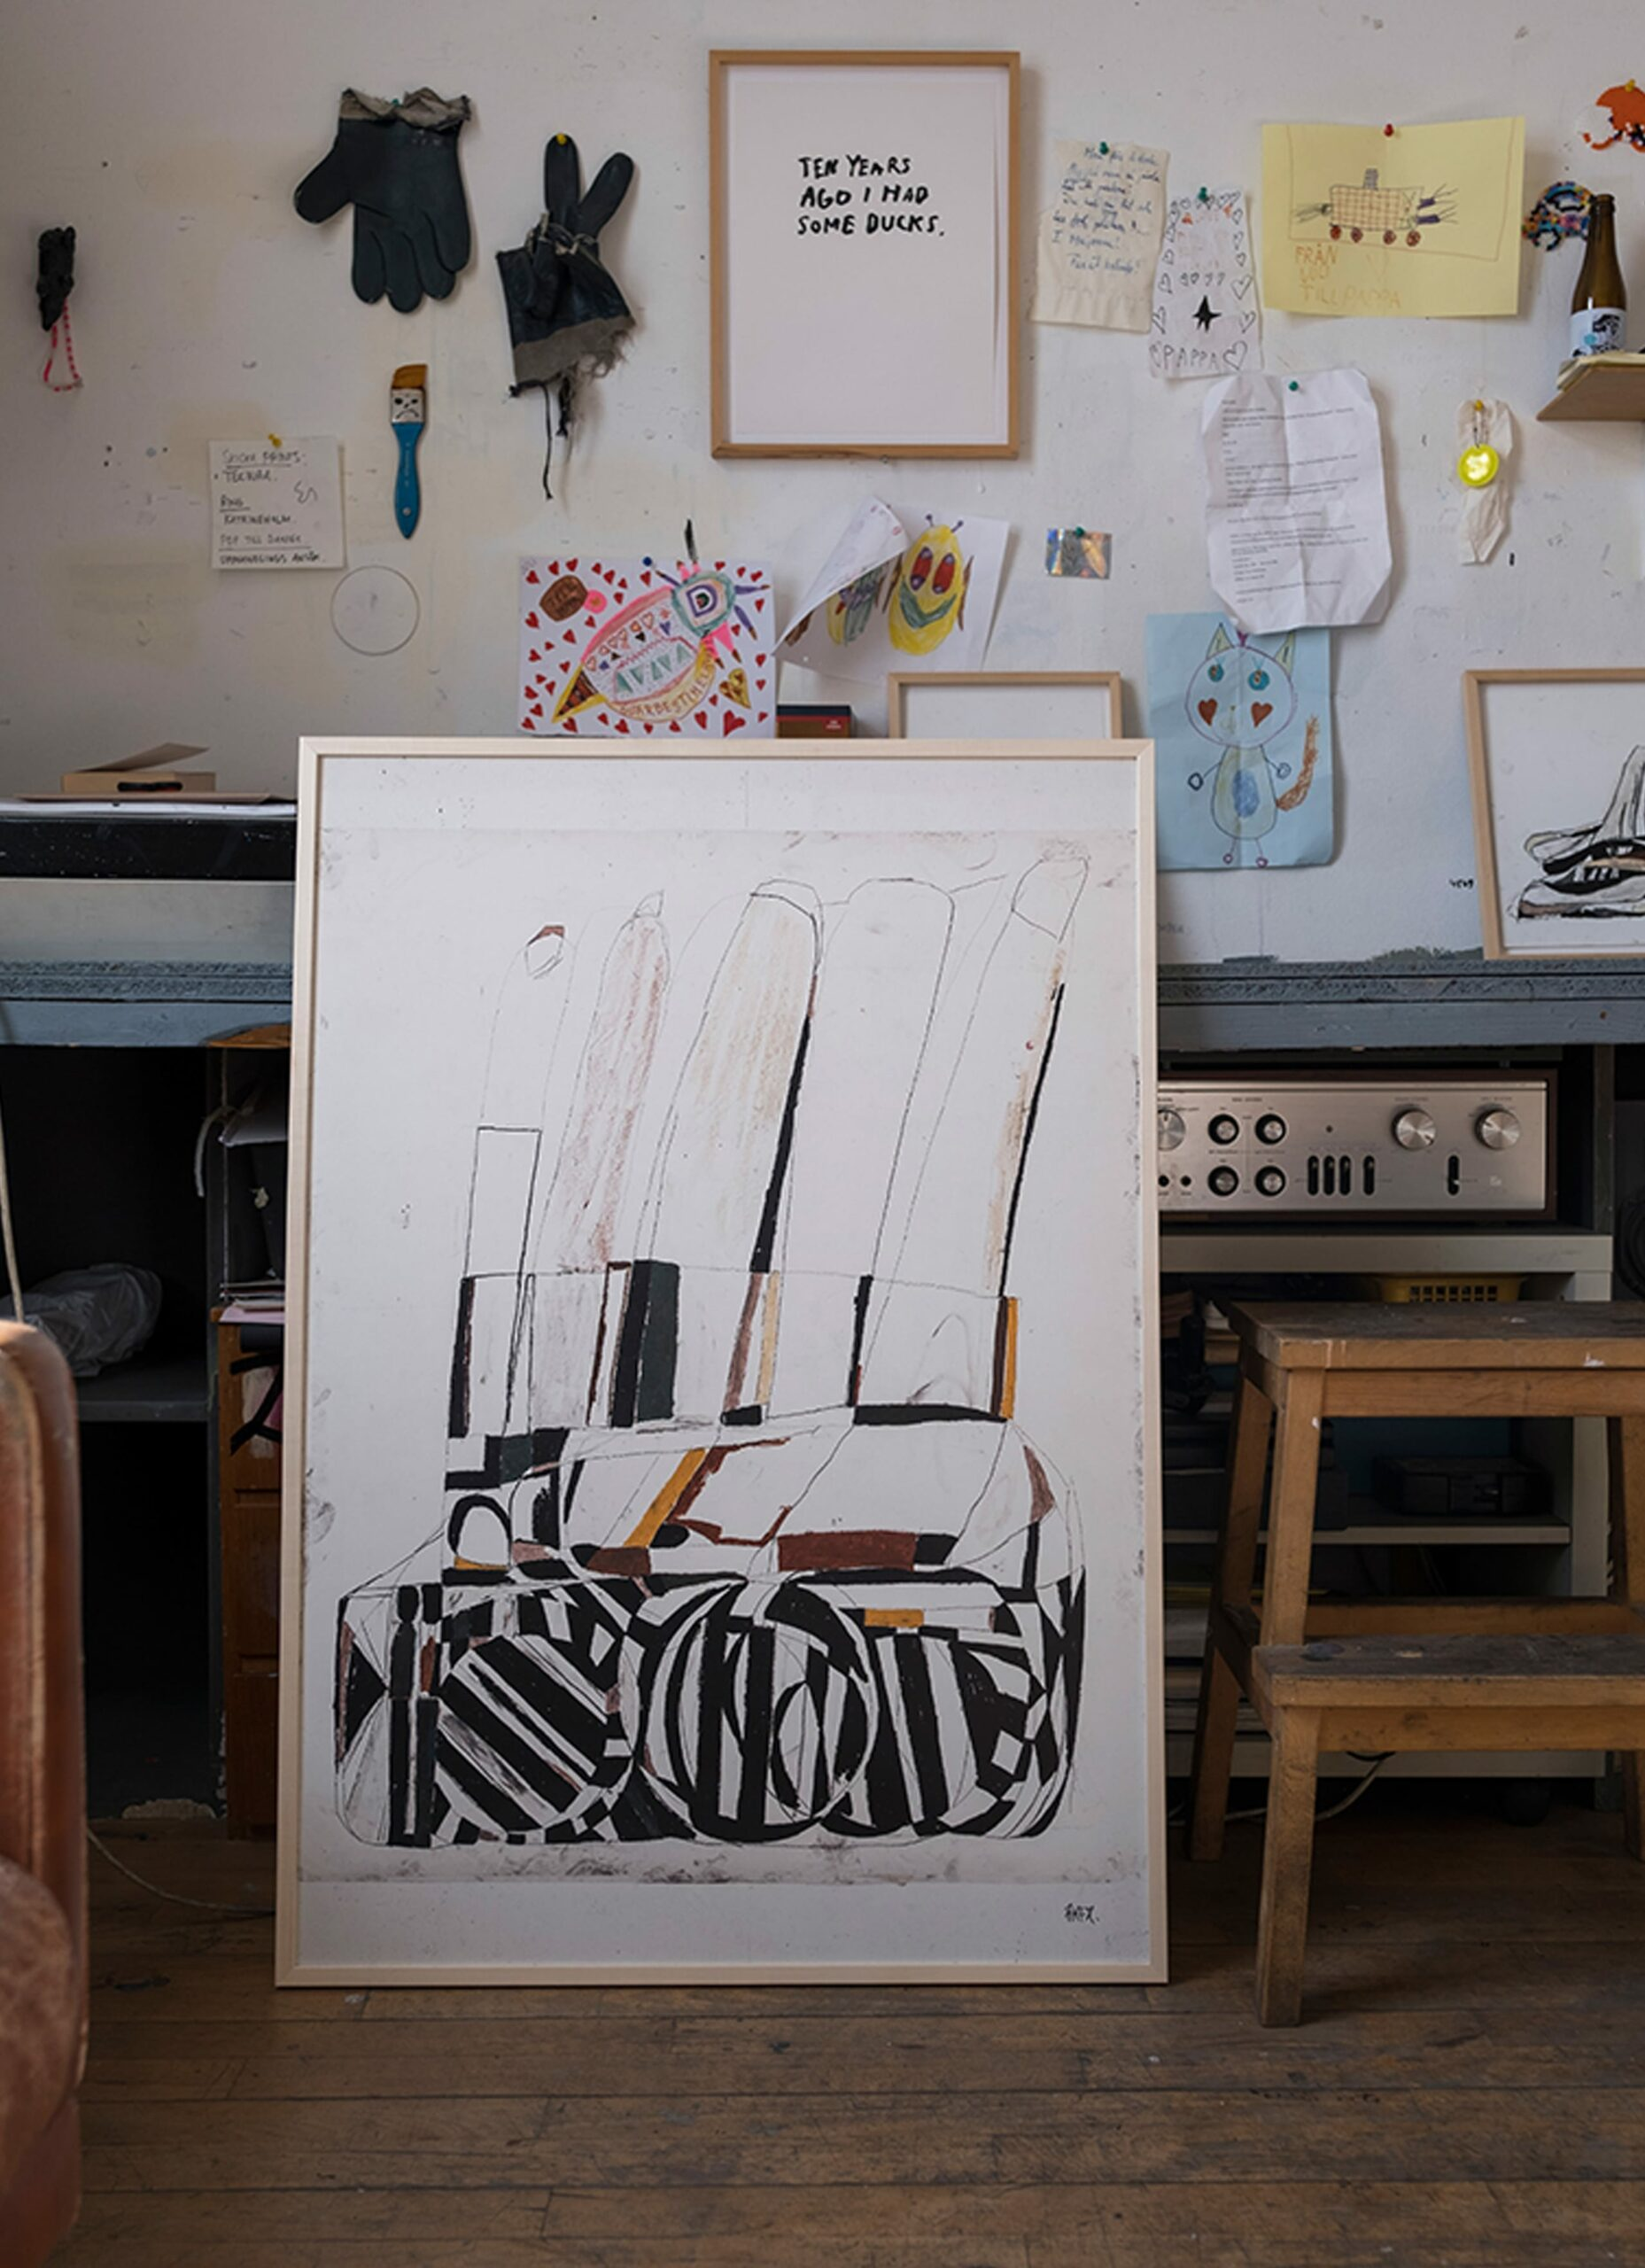 Fine Little Day - EKTA - Takes time to pass - Art print - 70cm x 100cm